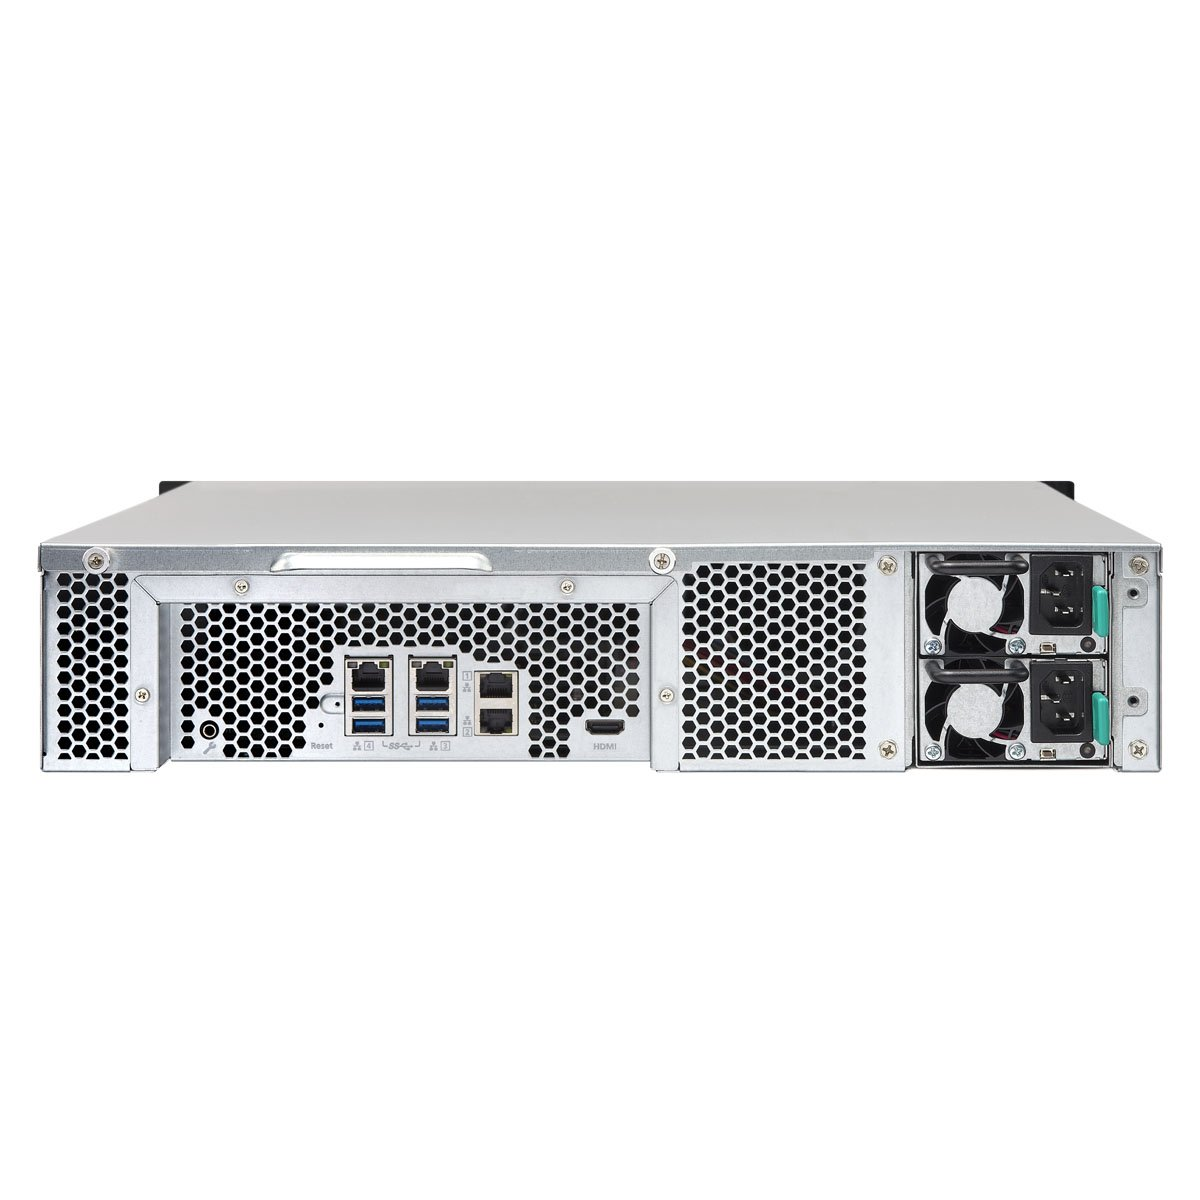 QNAP TS-1253U-RP 12-bay 2U iSCSI NAS, Intel 2.0GHz Quad Core CPU with 4GB RAM, 2.5''/3.5'' SATA 6Gb/s, Hot-swappable, Redundant PSU by QNAP (Image #4)